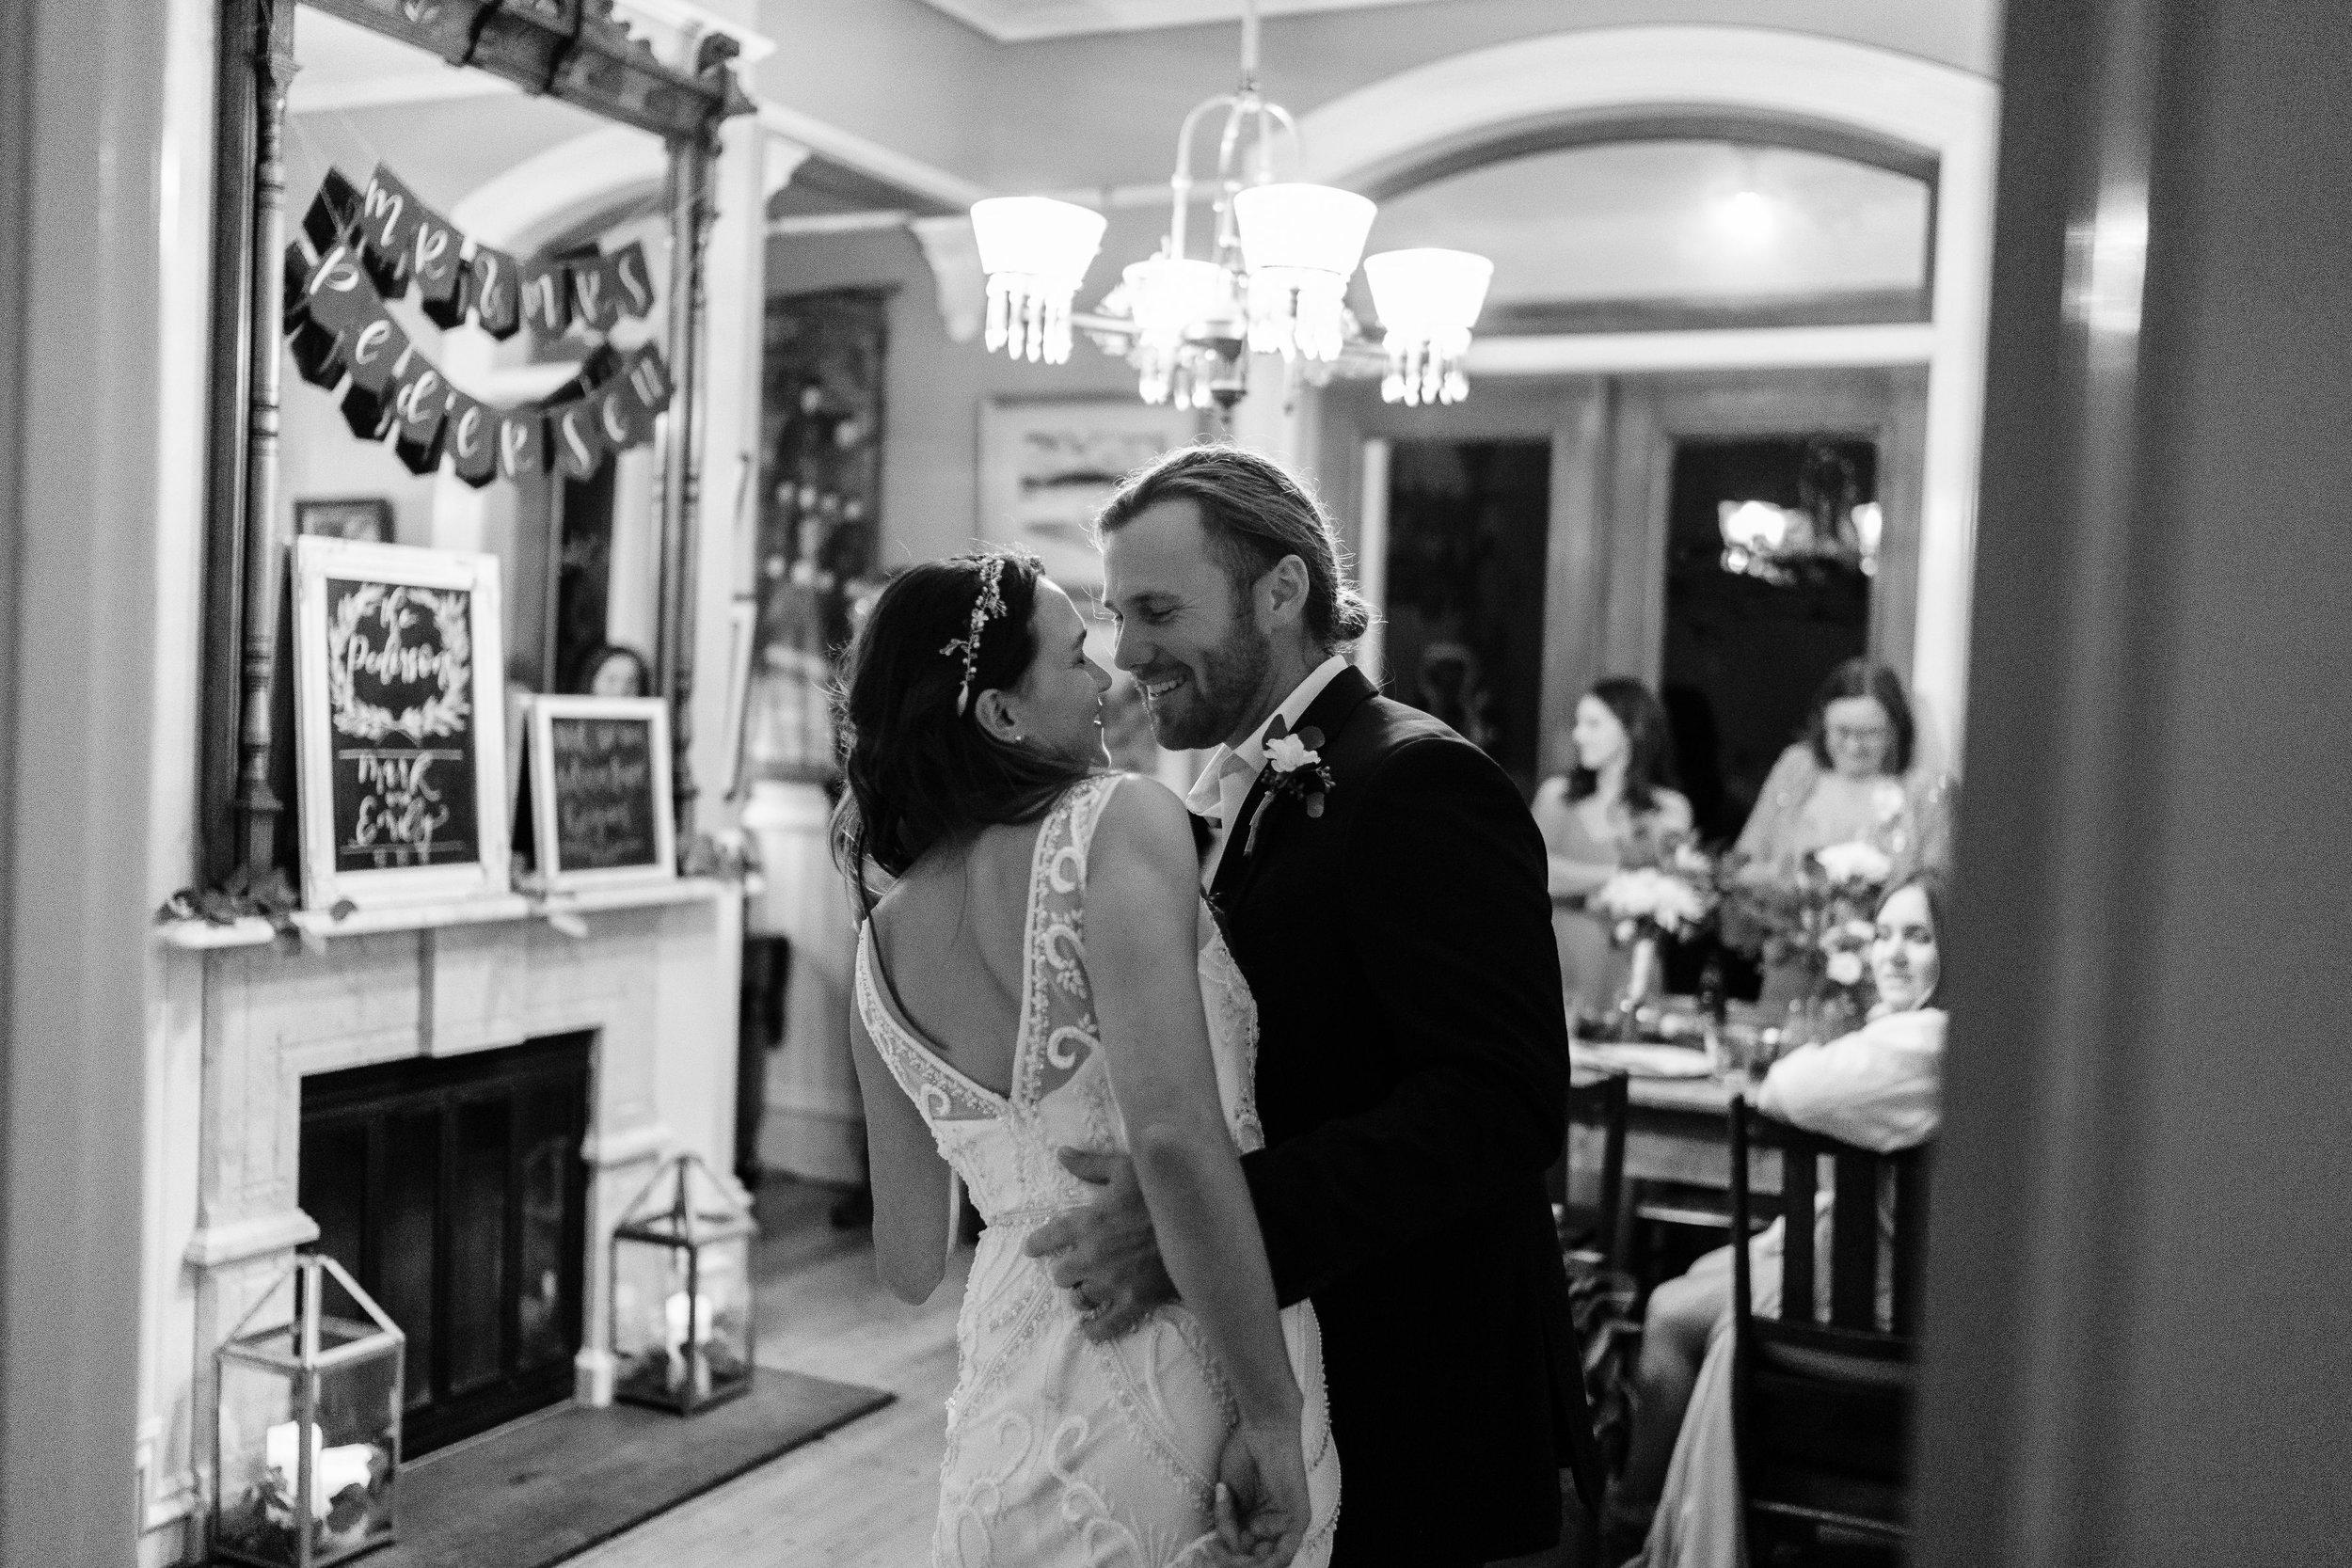 switzer-farm-wedding-westport-brandon-bibbins-photograhy-fine-art-079.jpg